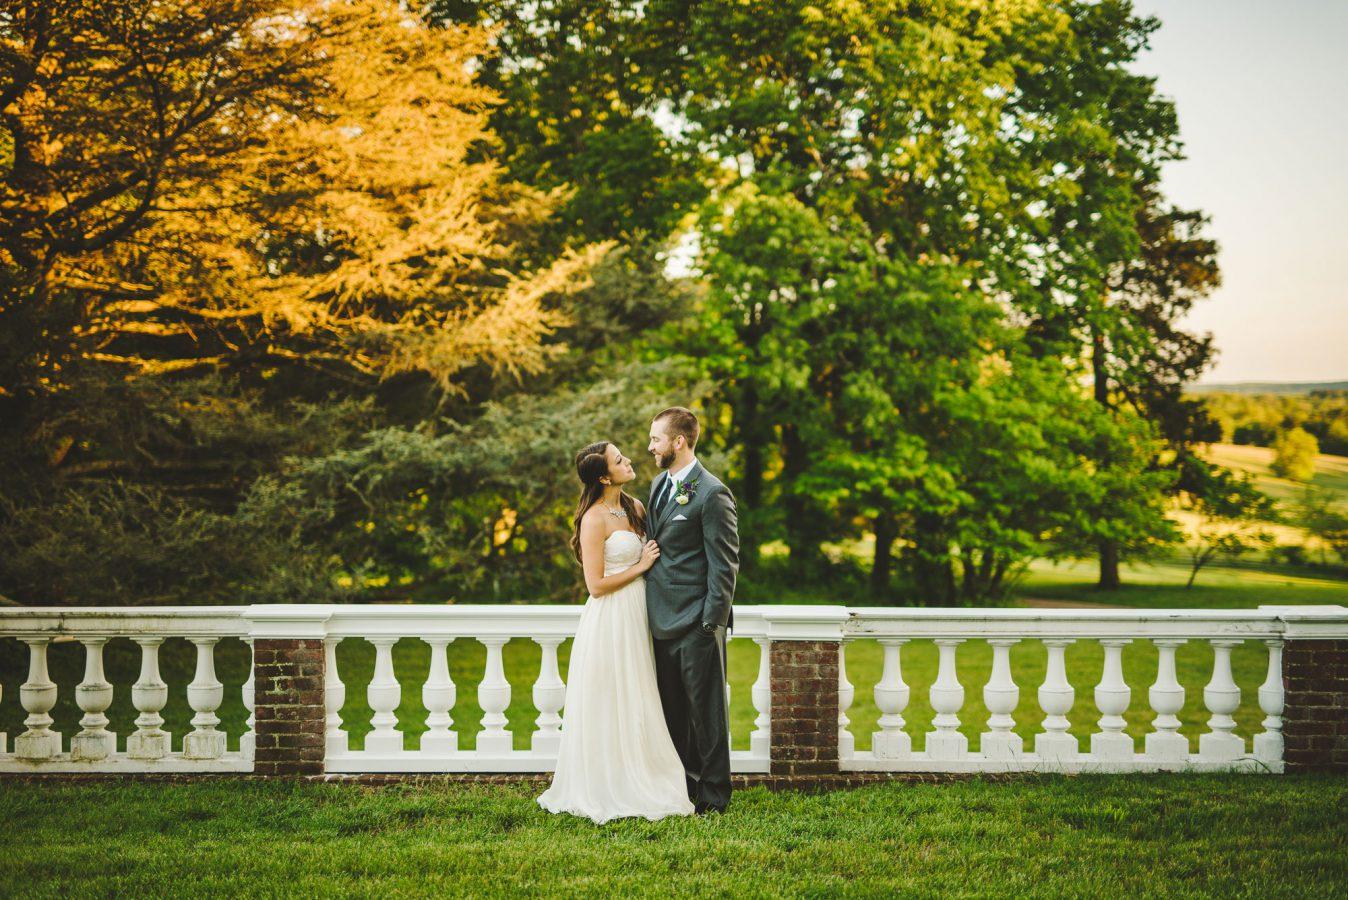 fete-photography-weddings-2017-006